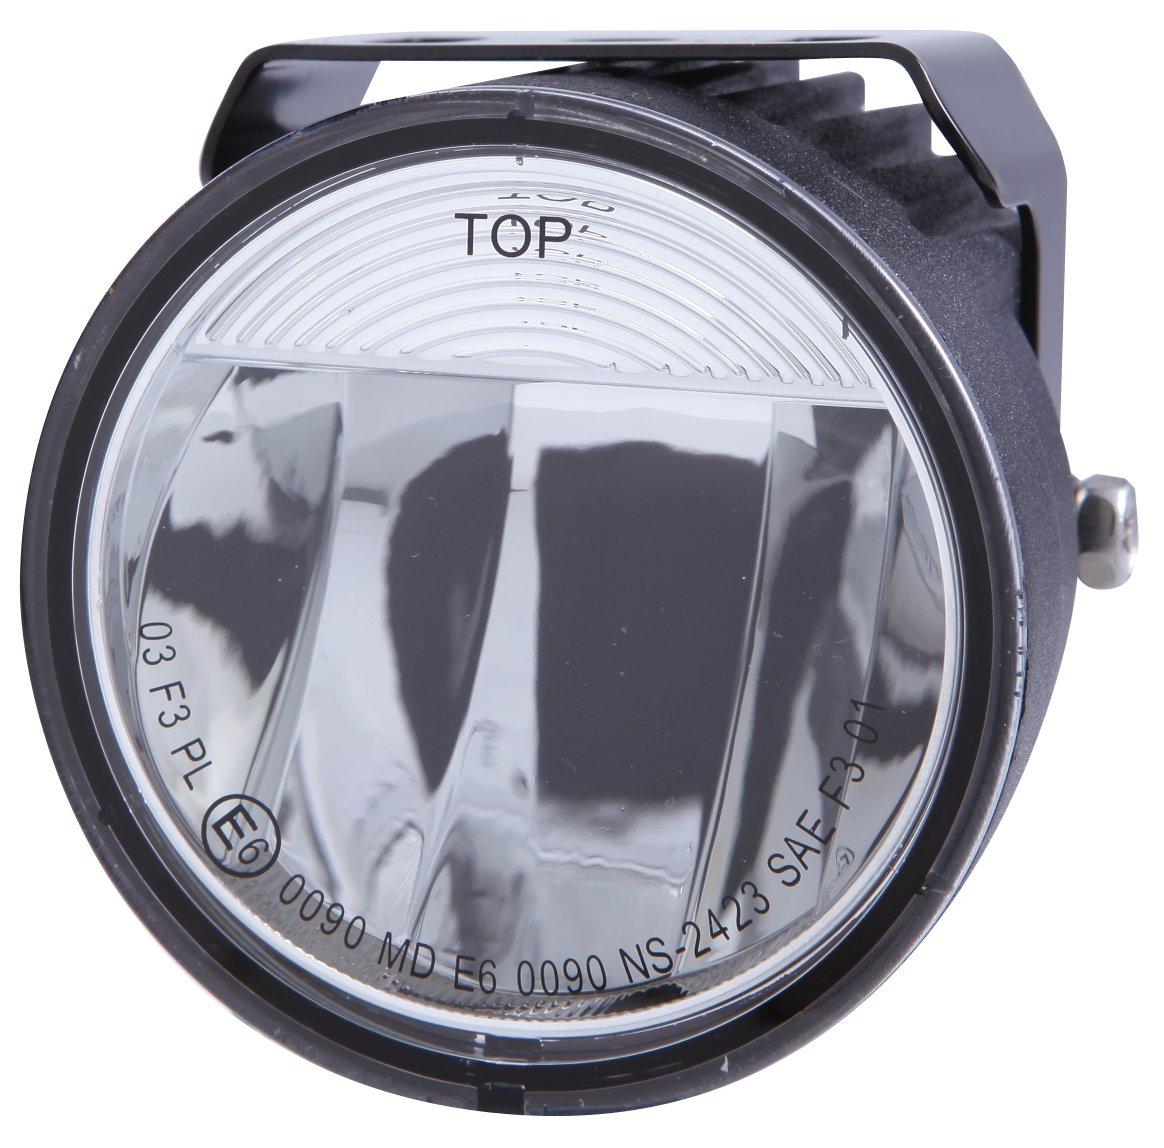 Automobile Fog Lamps for Lighting Series made by Sirius Light Technology Co., LTD 南勝企業股份有限公司 - MatchSupplier.com